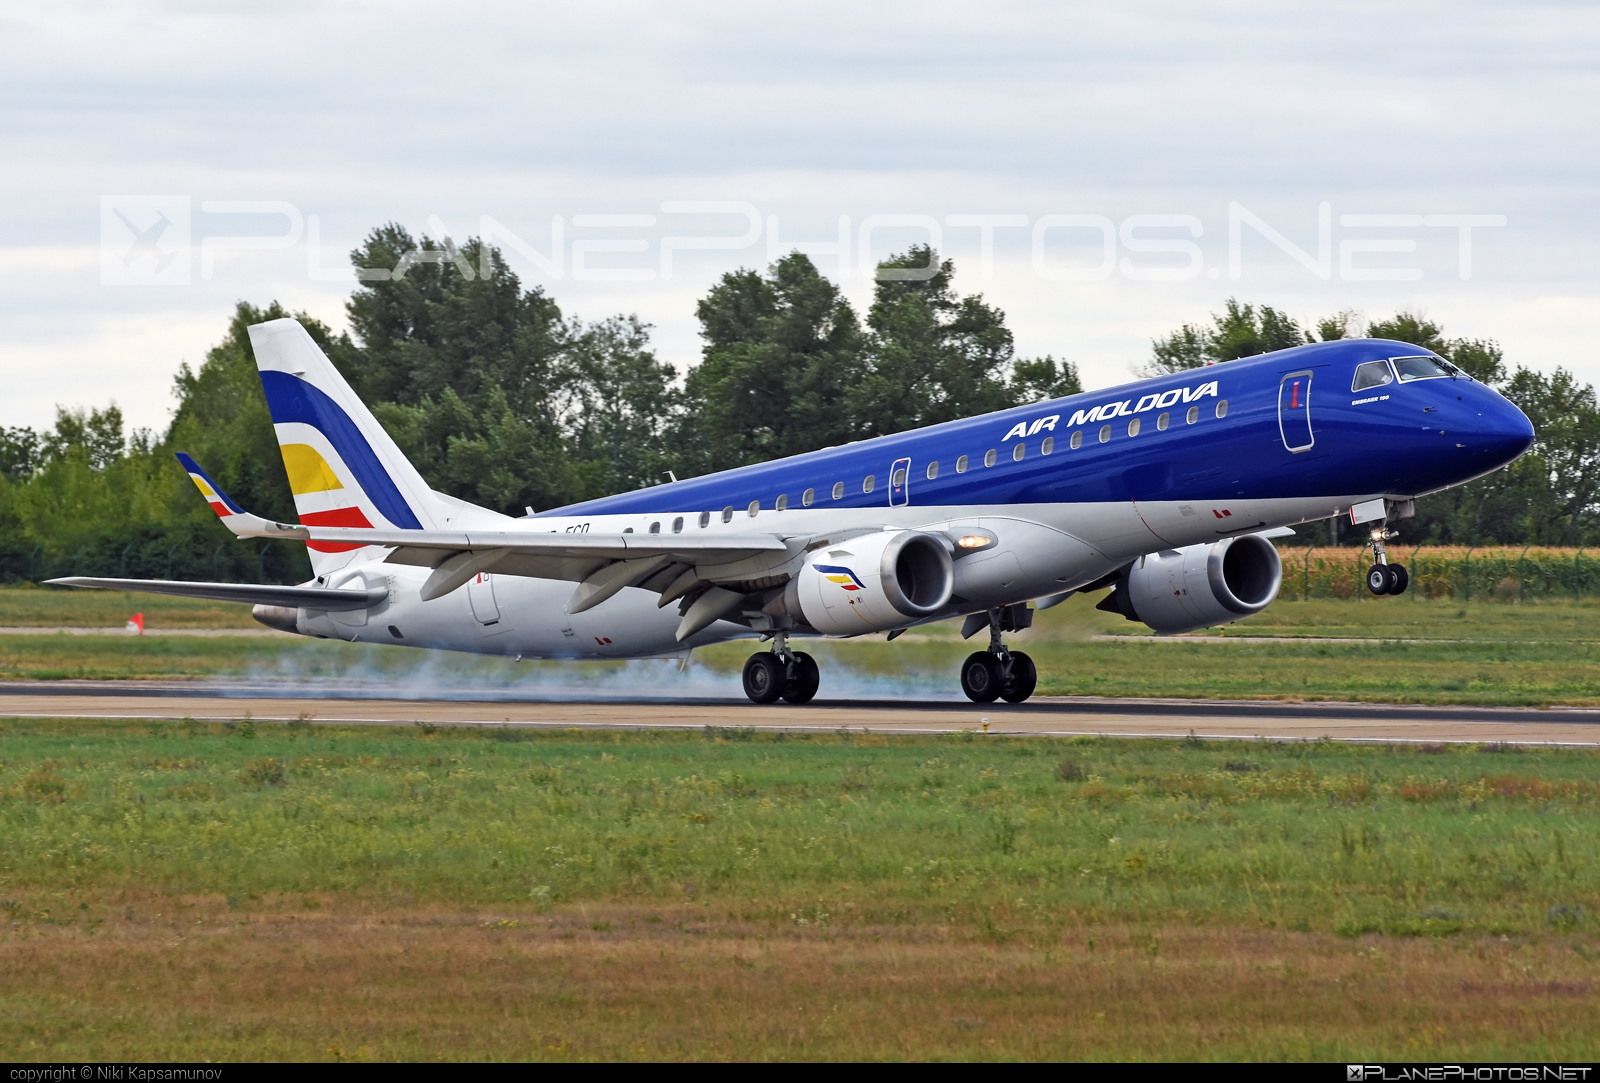 Embraer E190LR (ERJ-190-100LR) - ER-ECD operated by Air Moldova #e190 #e190100 #e190100lr #e190lr #embraer #embraer190 #embraer190100lr #embraer190lr